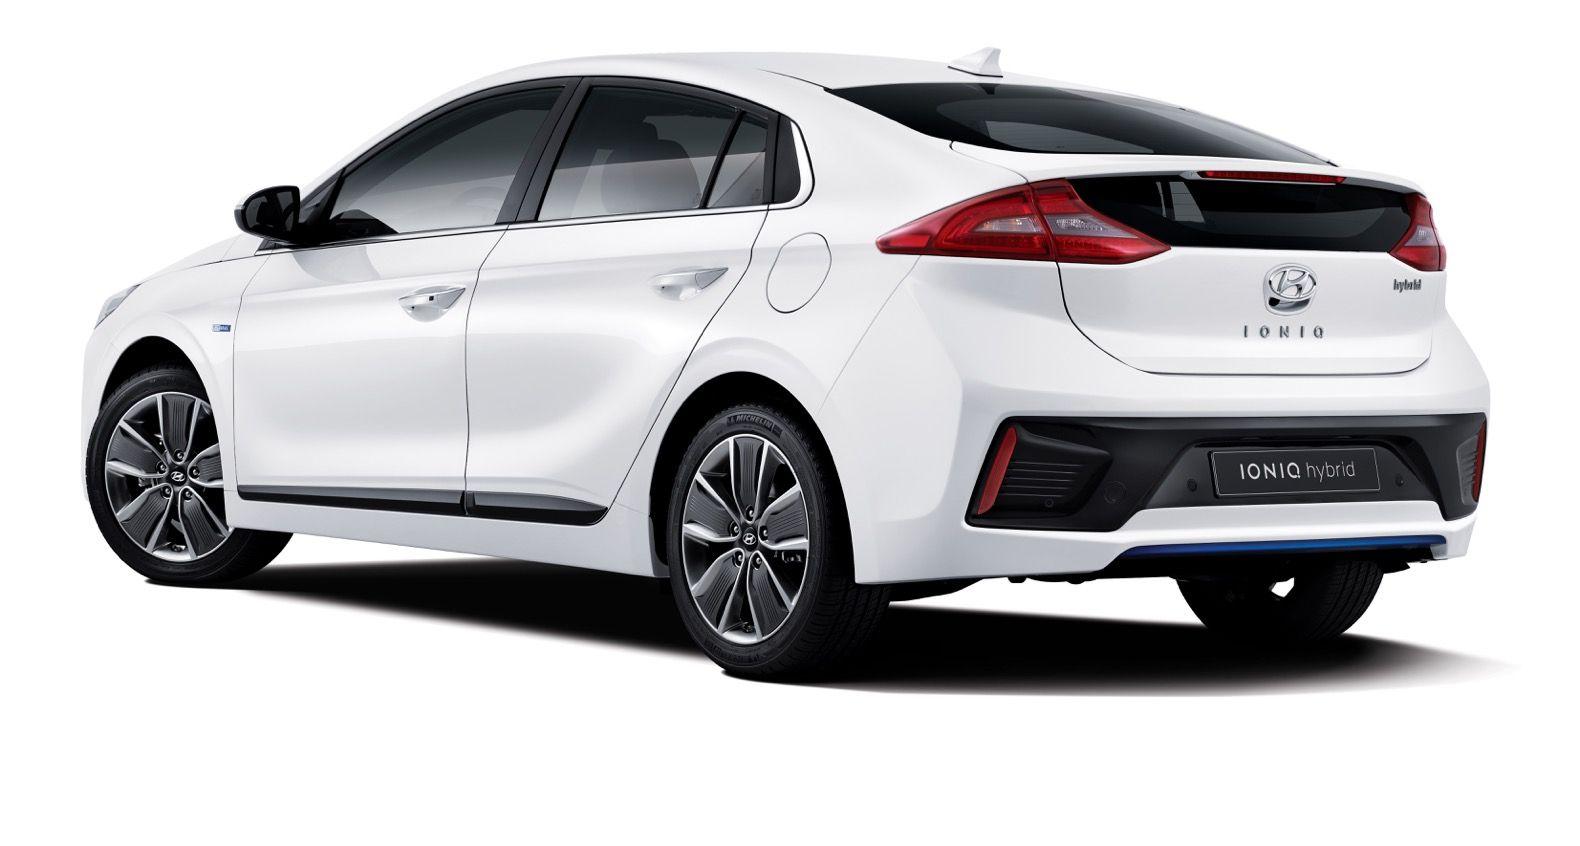 Hyundai S New Hybrid Ioniq Is The First Car To Take On The Toyota Prius Toyota Prius Hybrid Car Hyundai Motor